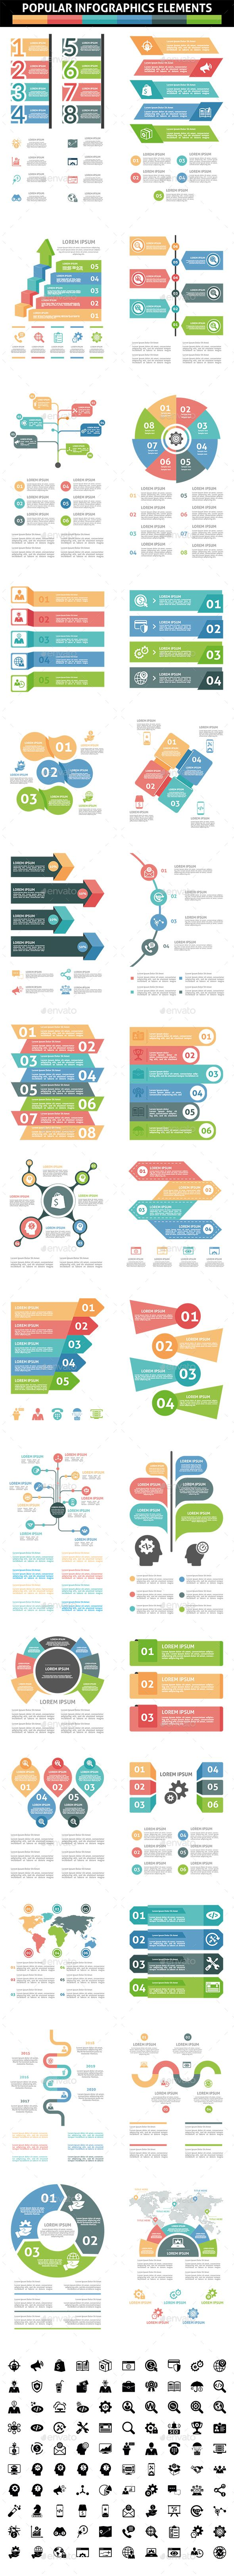 Popular Infographic Elements - #Infographics